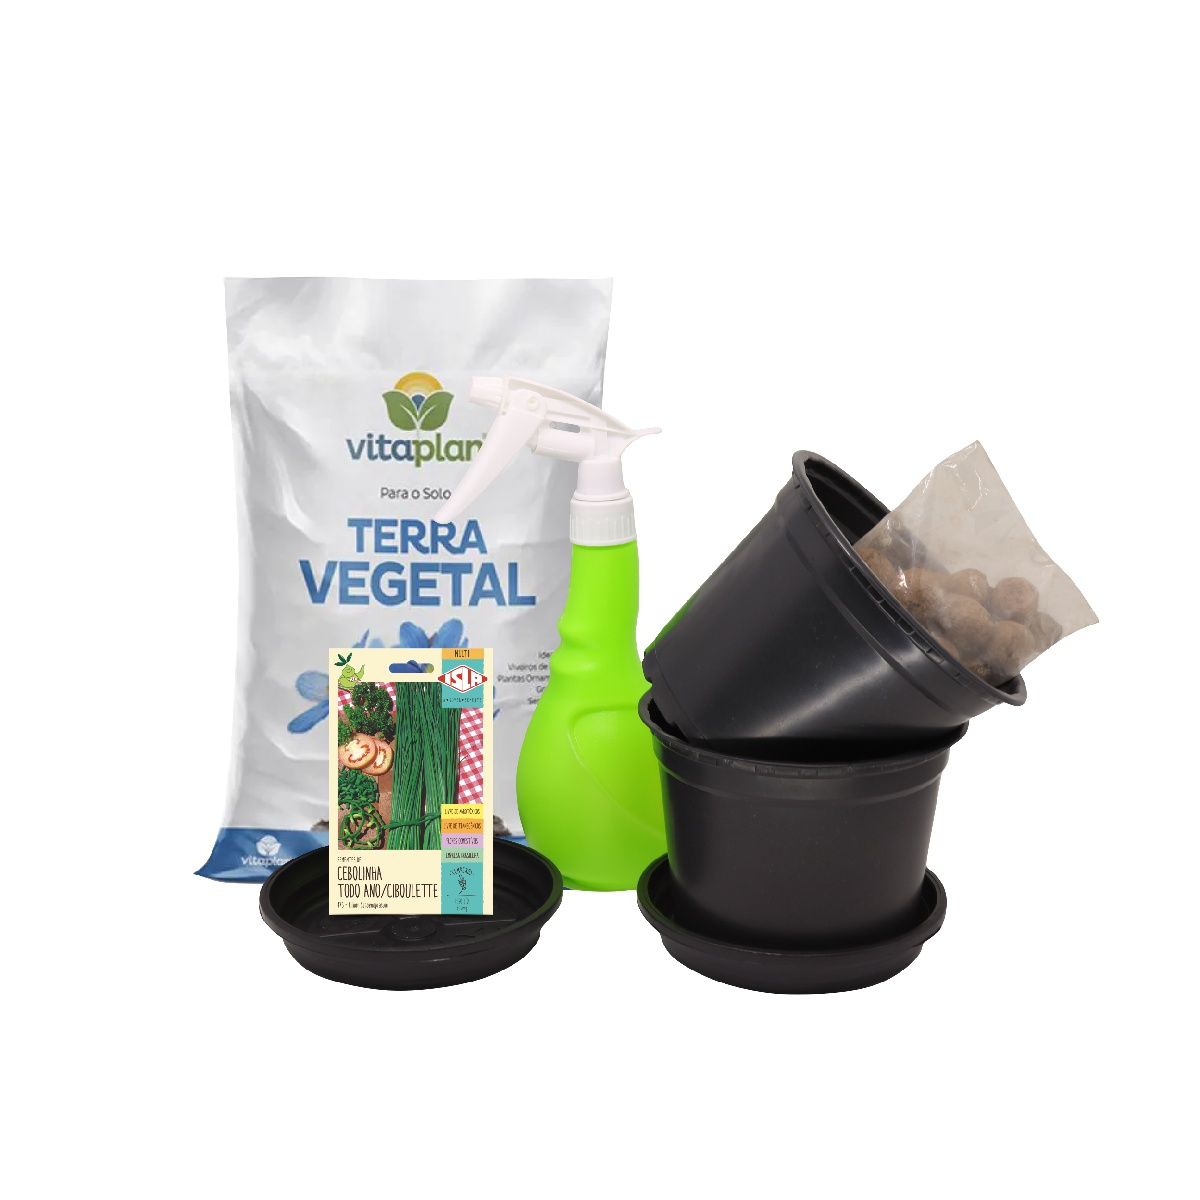 Kit Completo Horta em Vasos Cebolinha